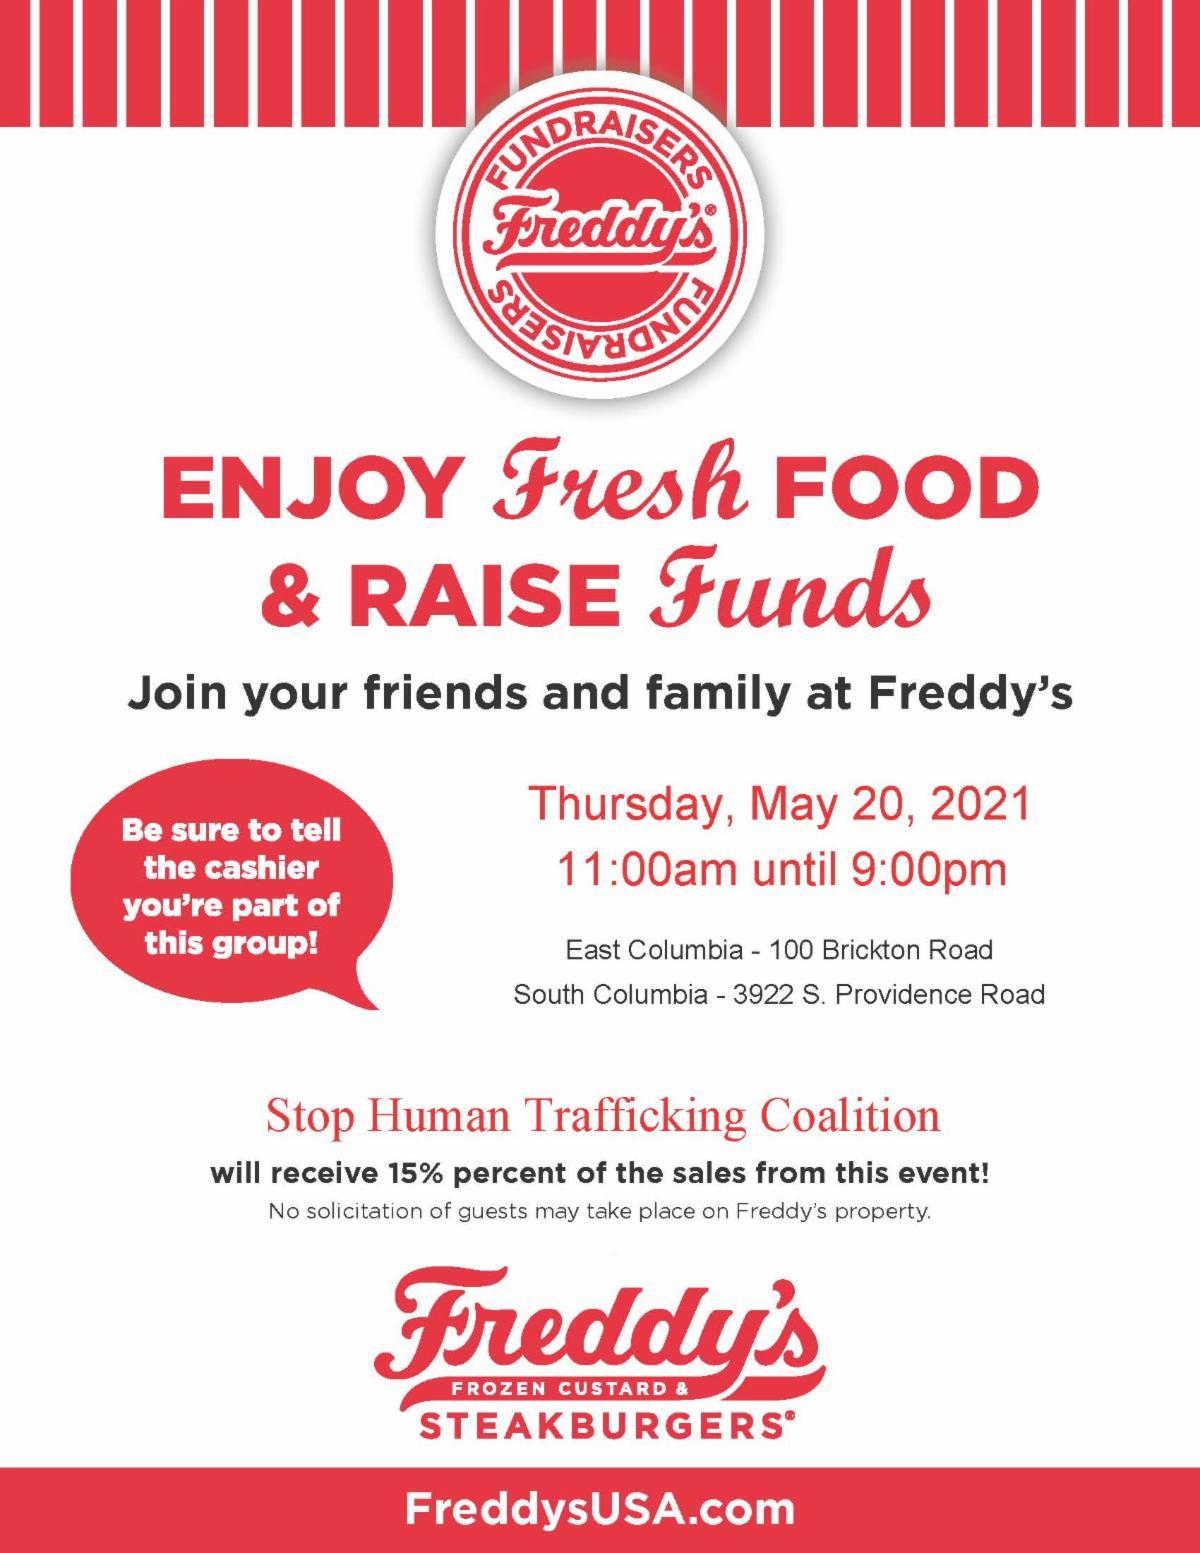 Freddy_s - Stop Human Trafficking Coalition 5-20-2021.jpg